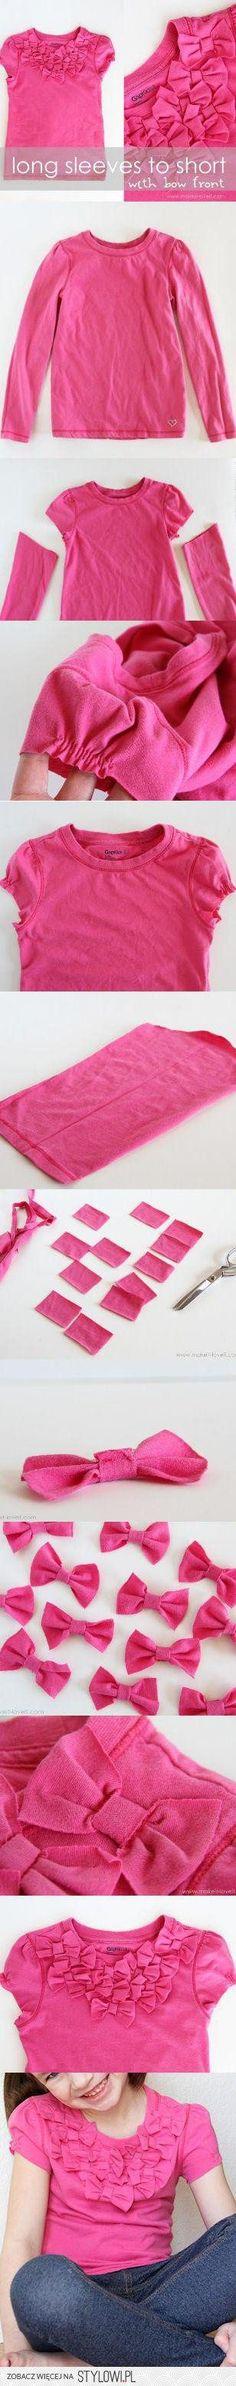 cute idea to reuse my tee for my girl